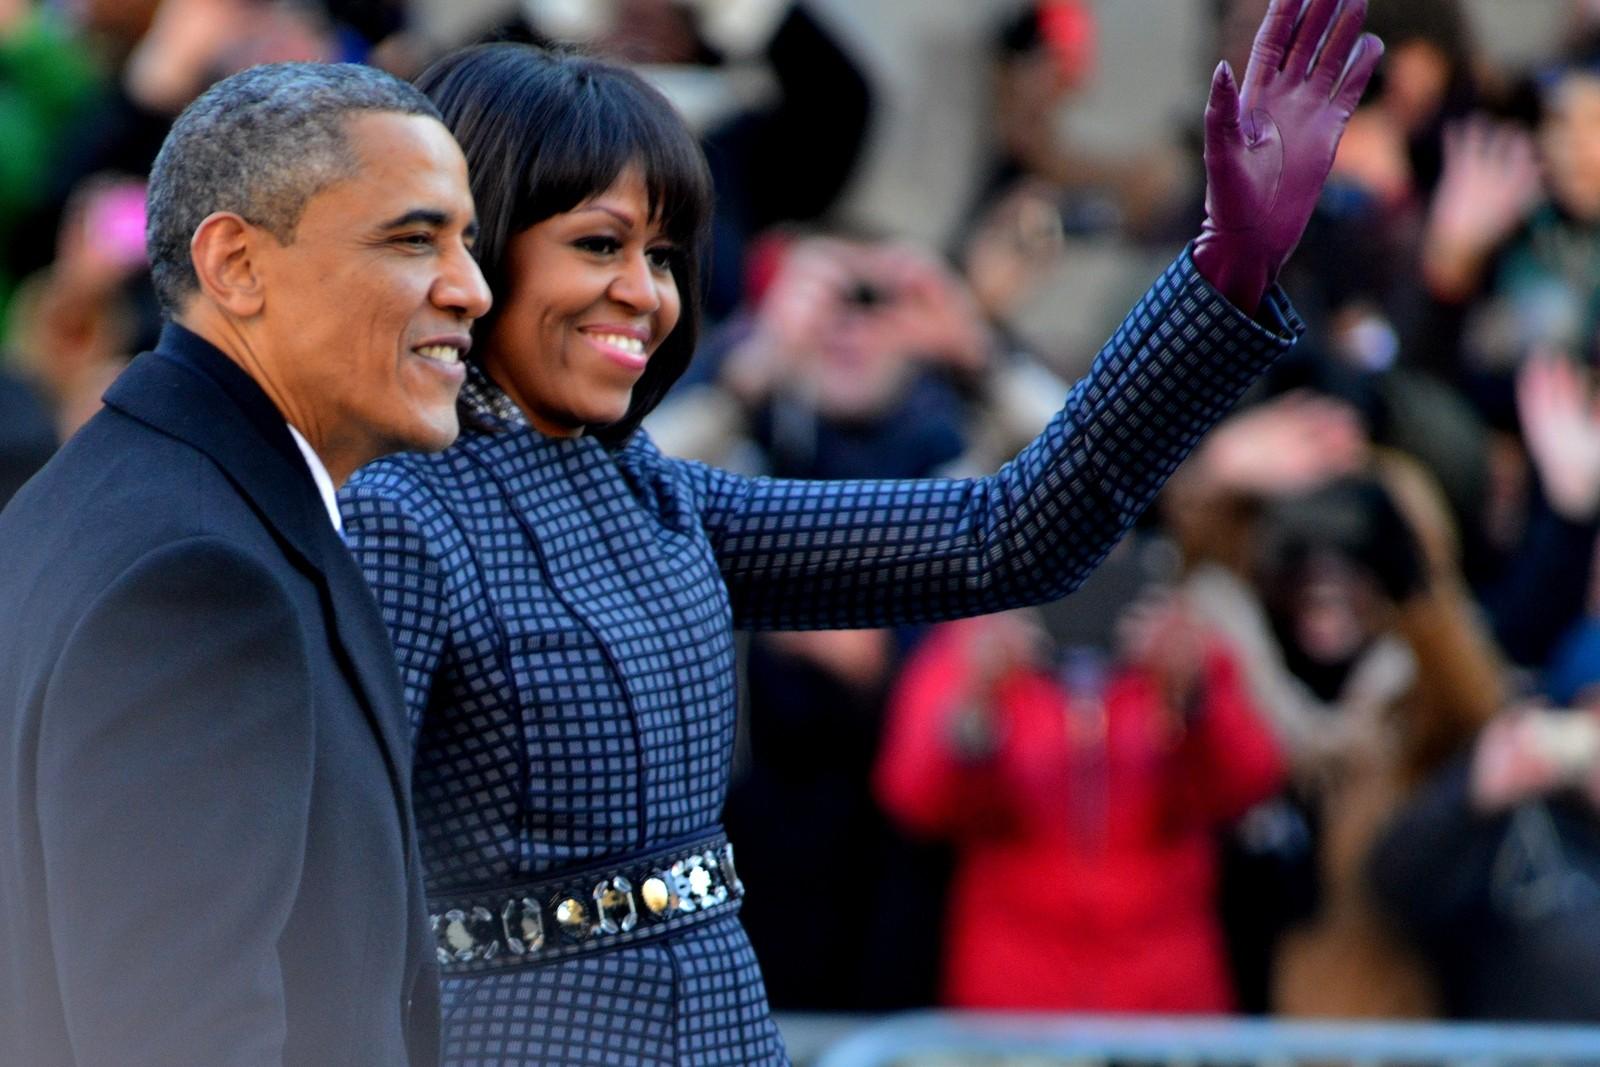 U.S. President Barack Obama - Michelle Obama - 2013 Presidential